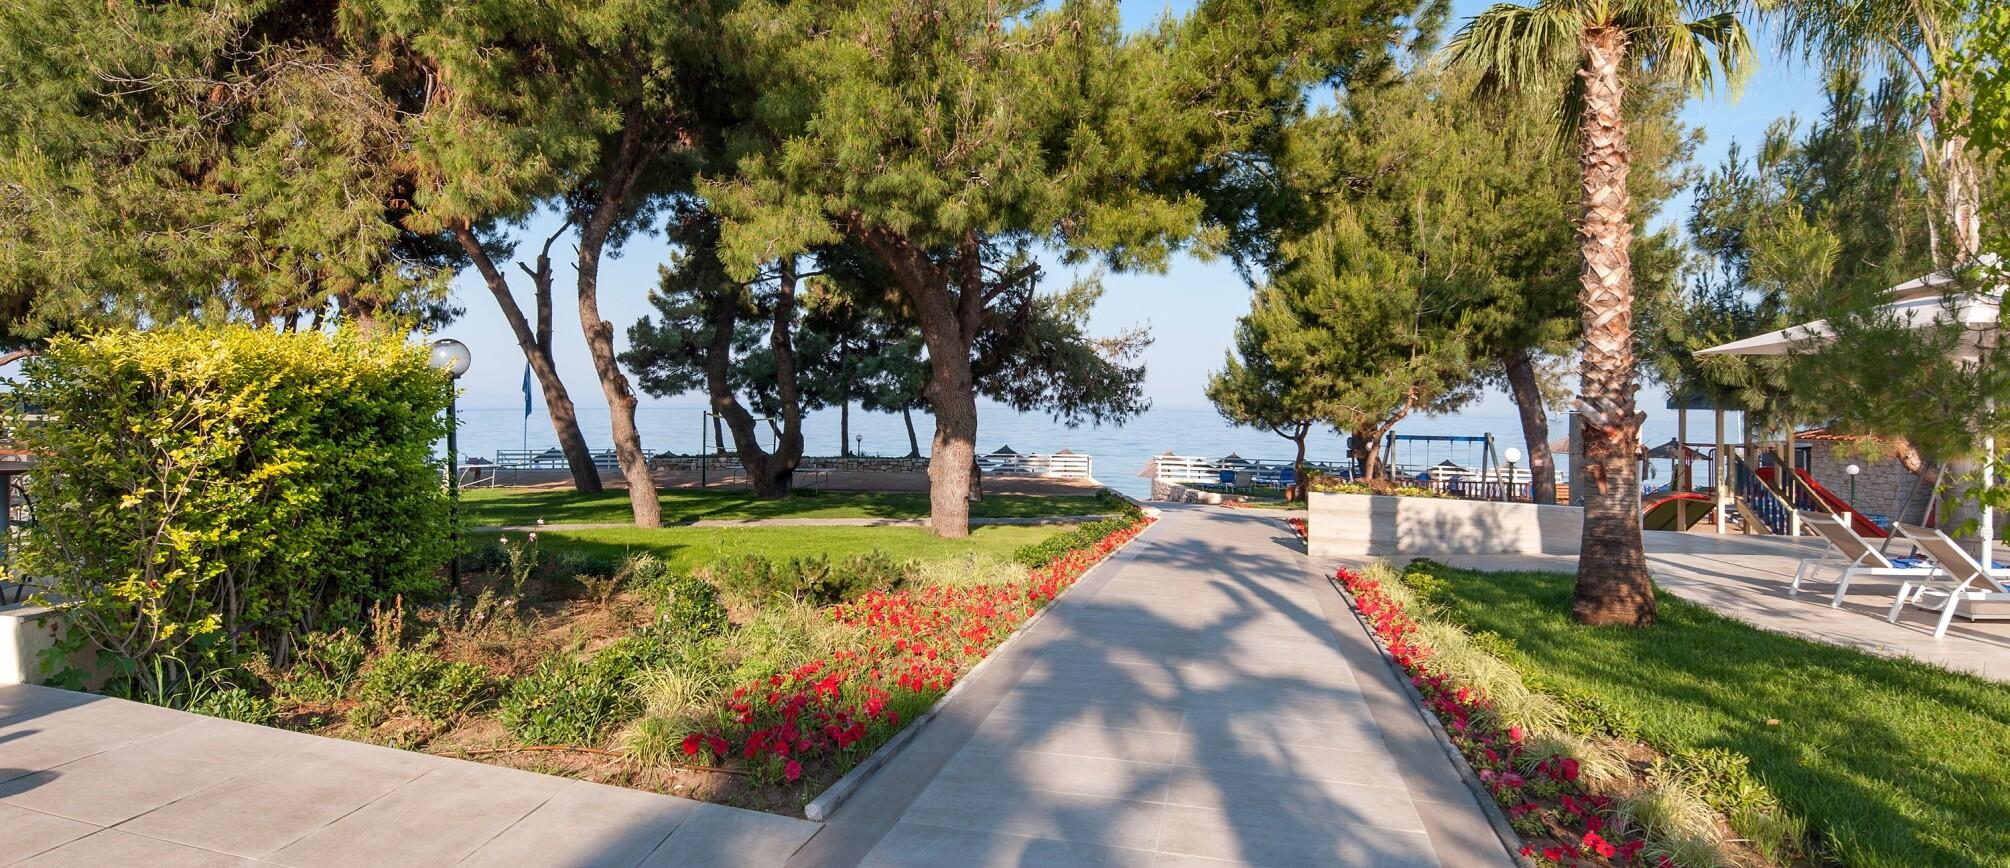 Portes Beach Hotel - градина